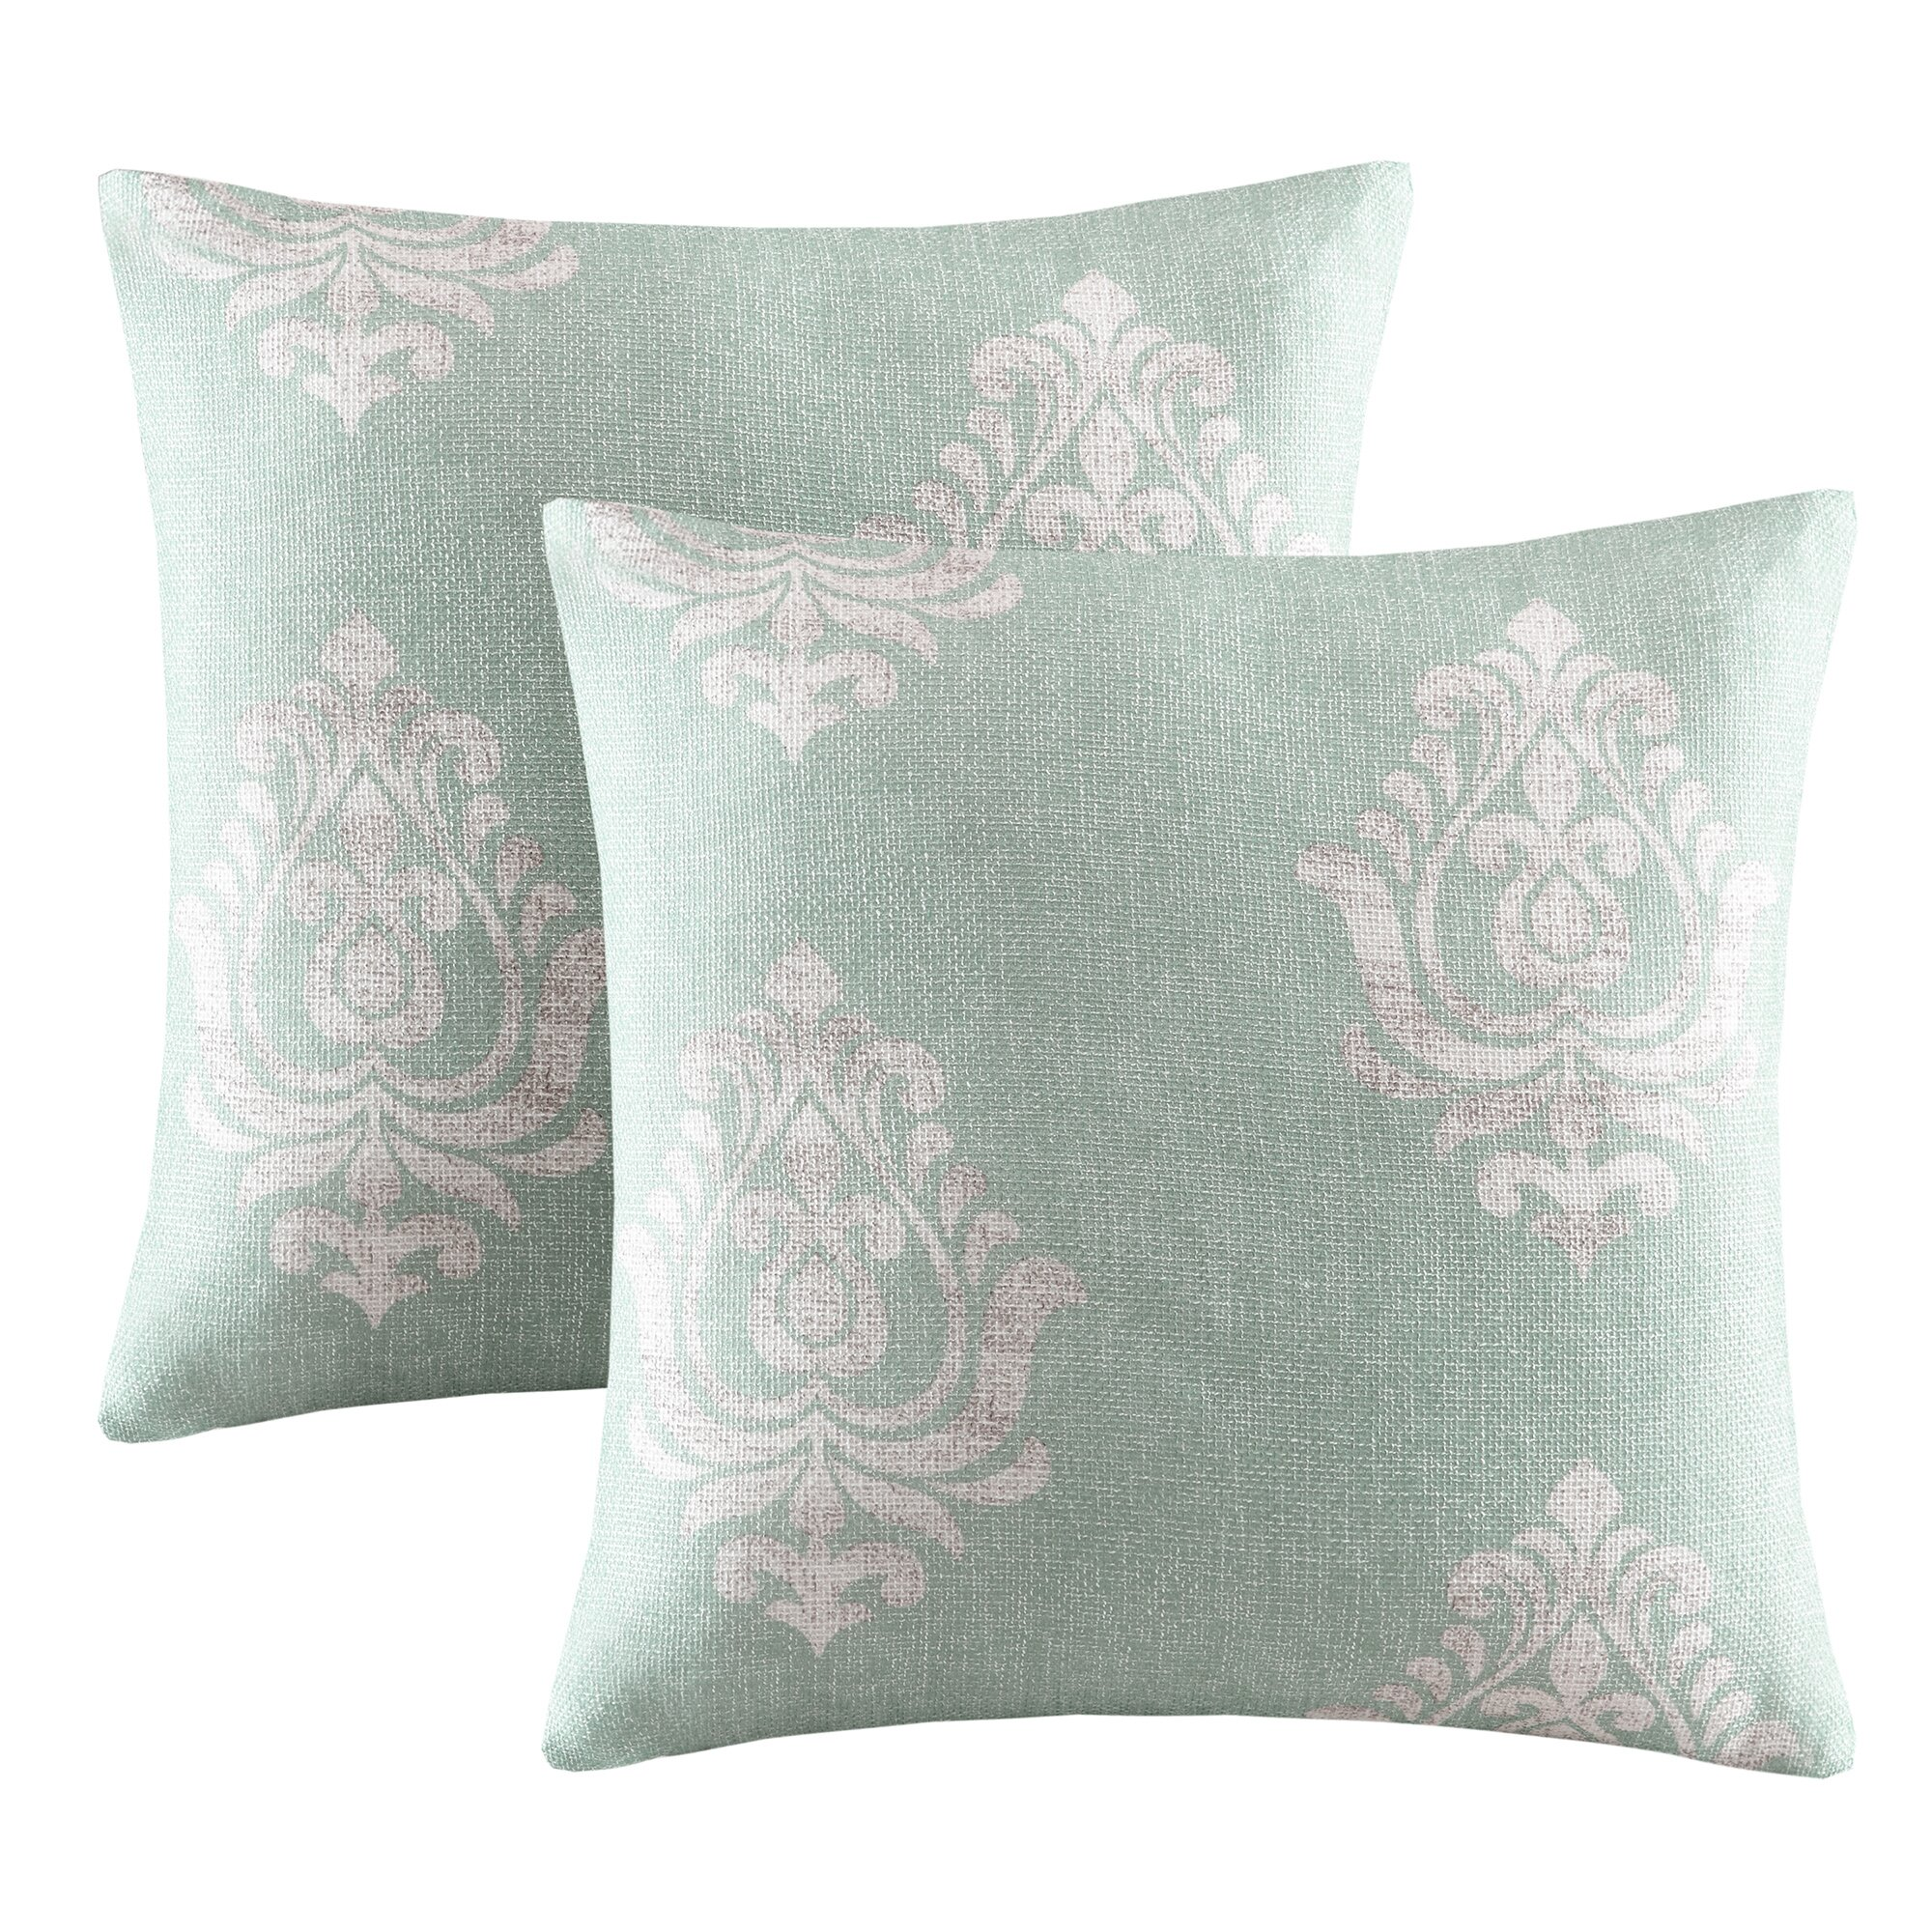 Alcott Hill Morrisdale Texture Damask Printed Throw Pillow & Reviews Wayfair